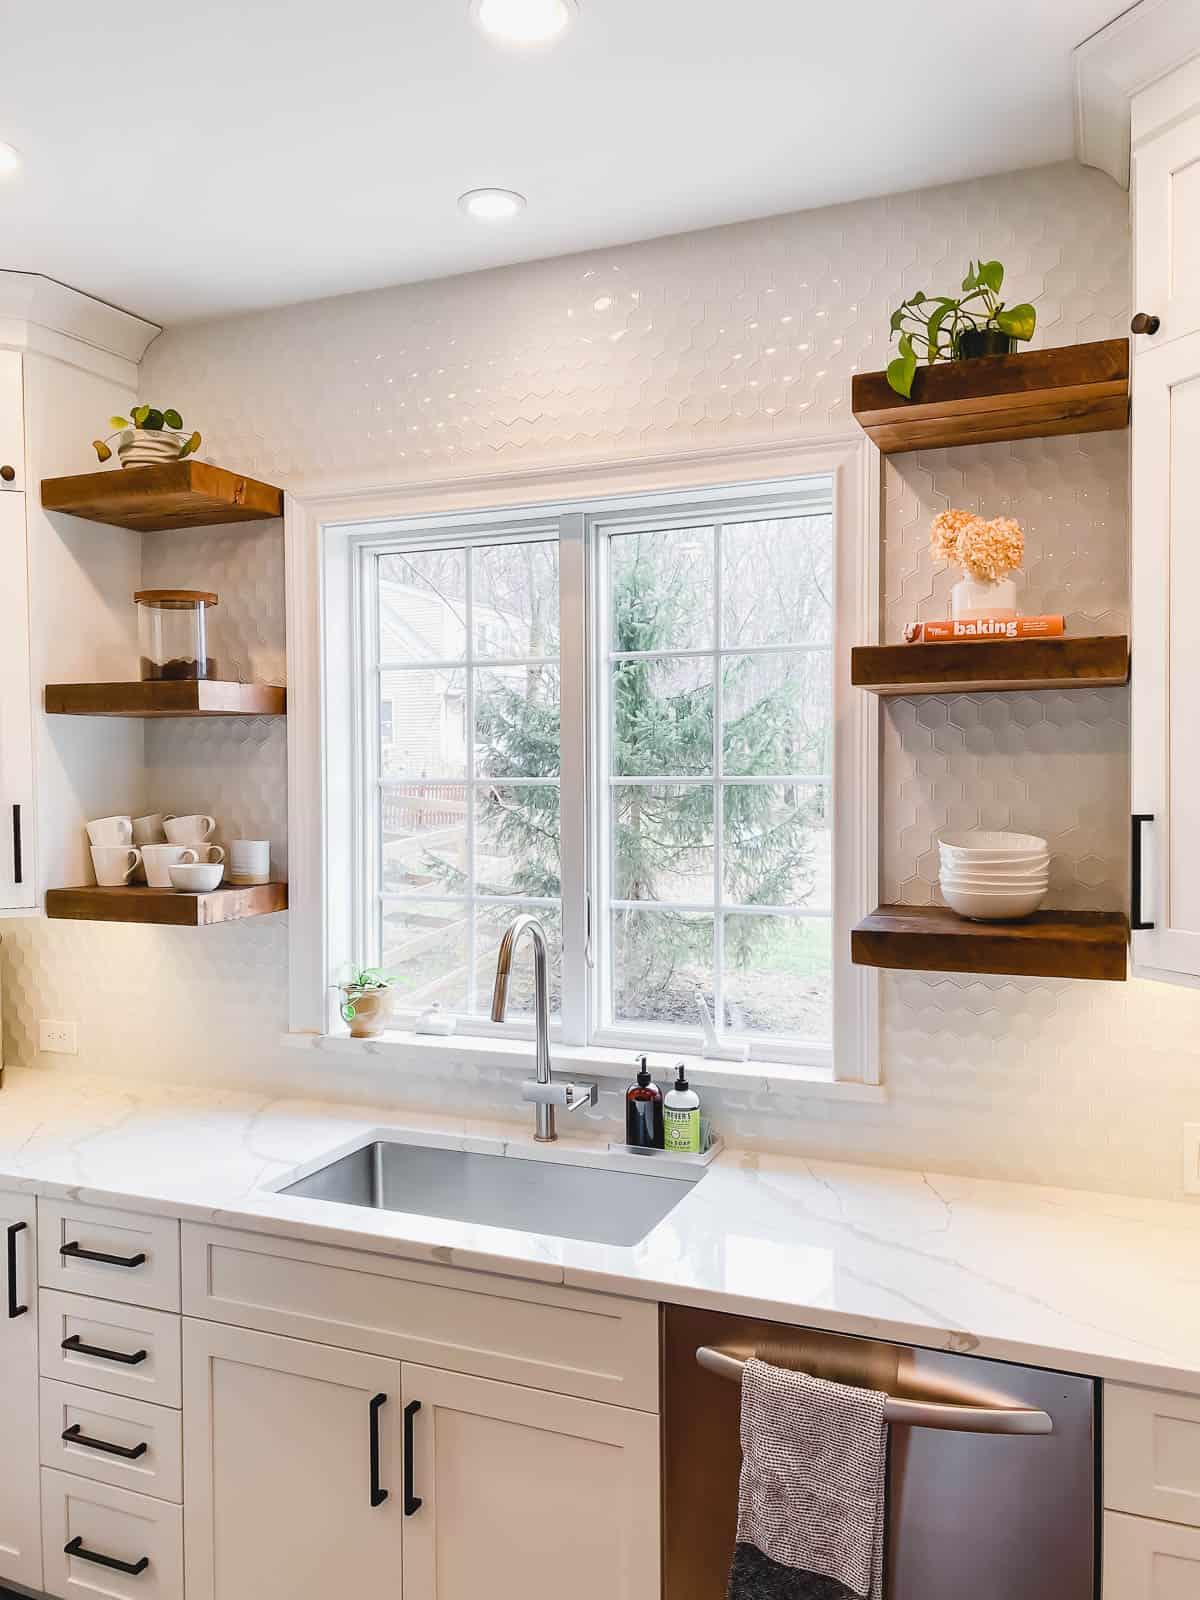 Open reclaimed wood shelving in kitchen